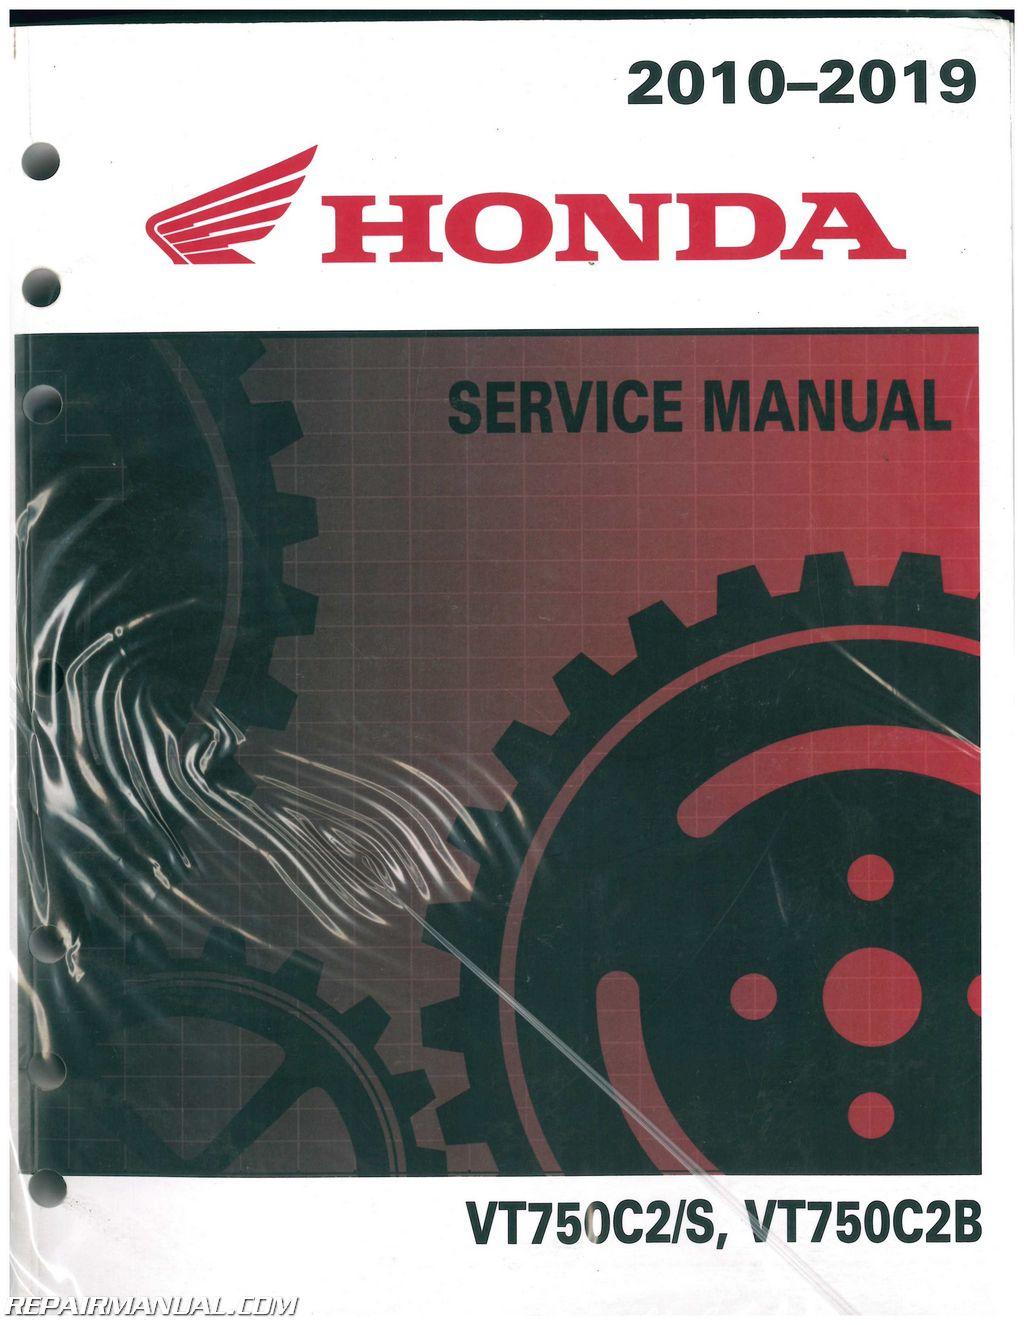 honda shadow signal light switch wiring 2010 2019 honda vt750c2 shadow spirit motorcycle service  2010 2019 honda vt750c2 shadow spirit